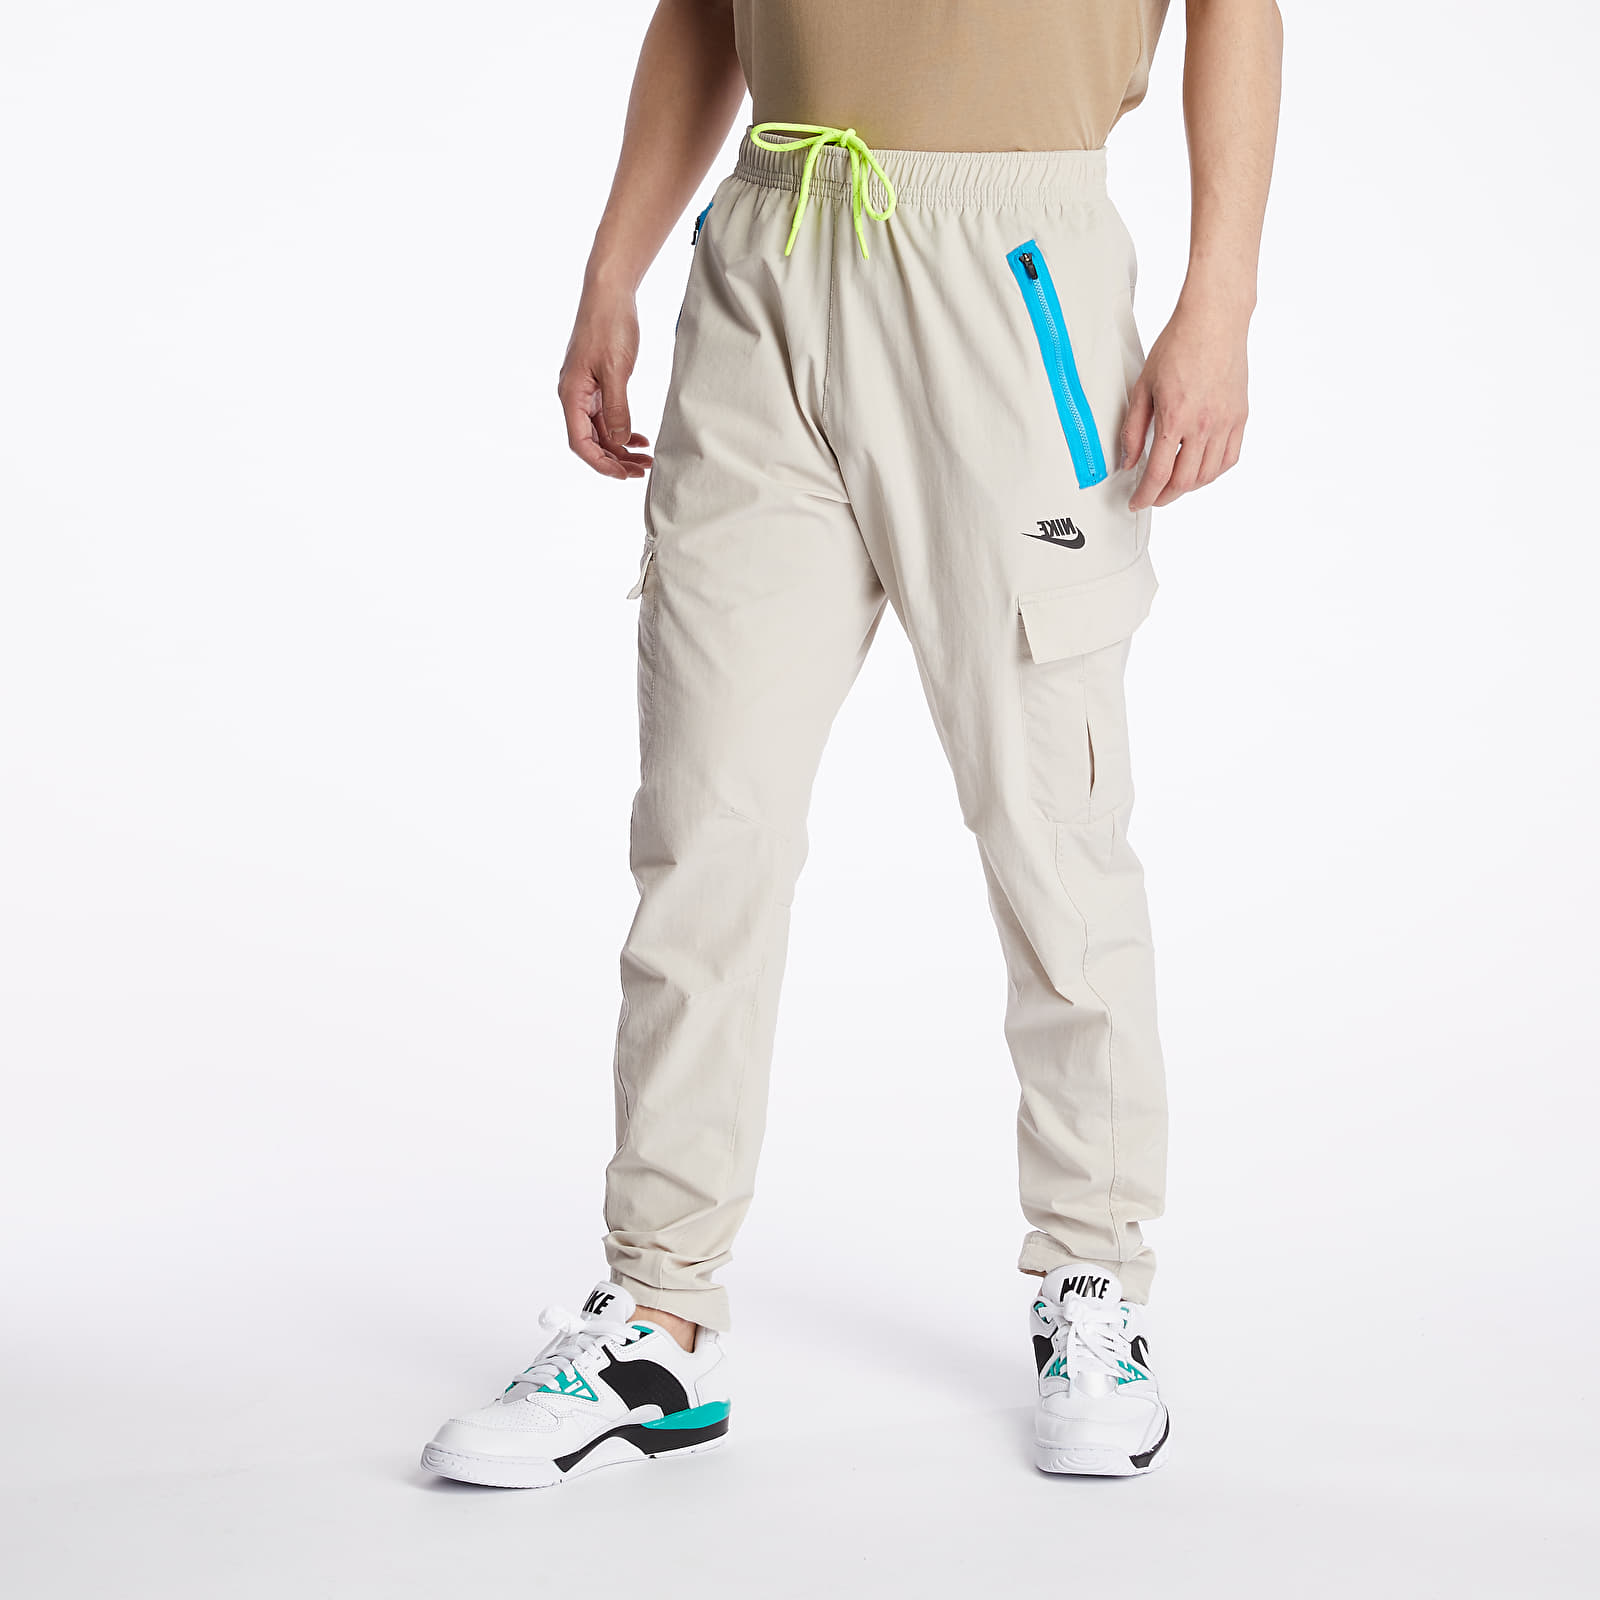 Pants and jeans Nike Sportswear Festival Woven Cargo Pants String/ Laser Blue/ Black